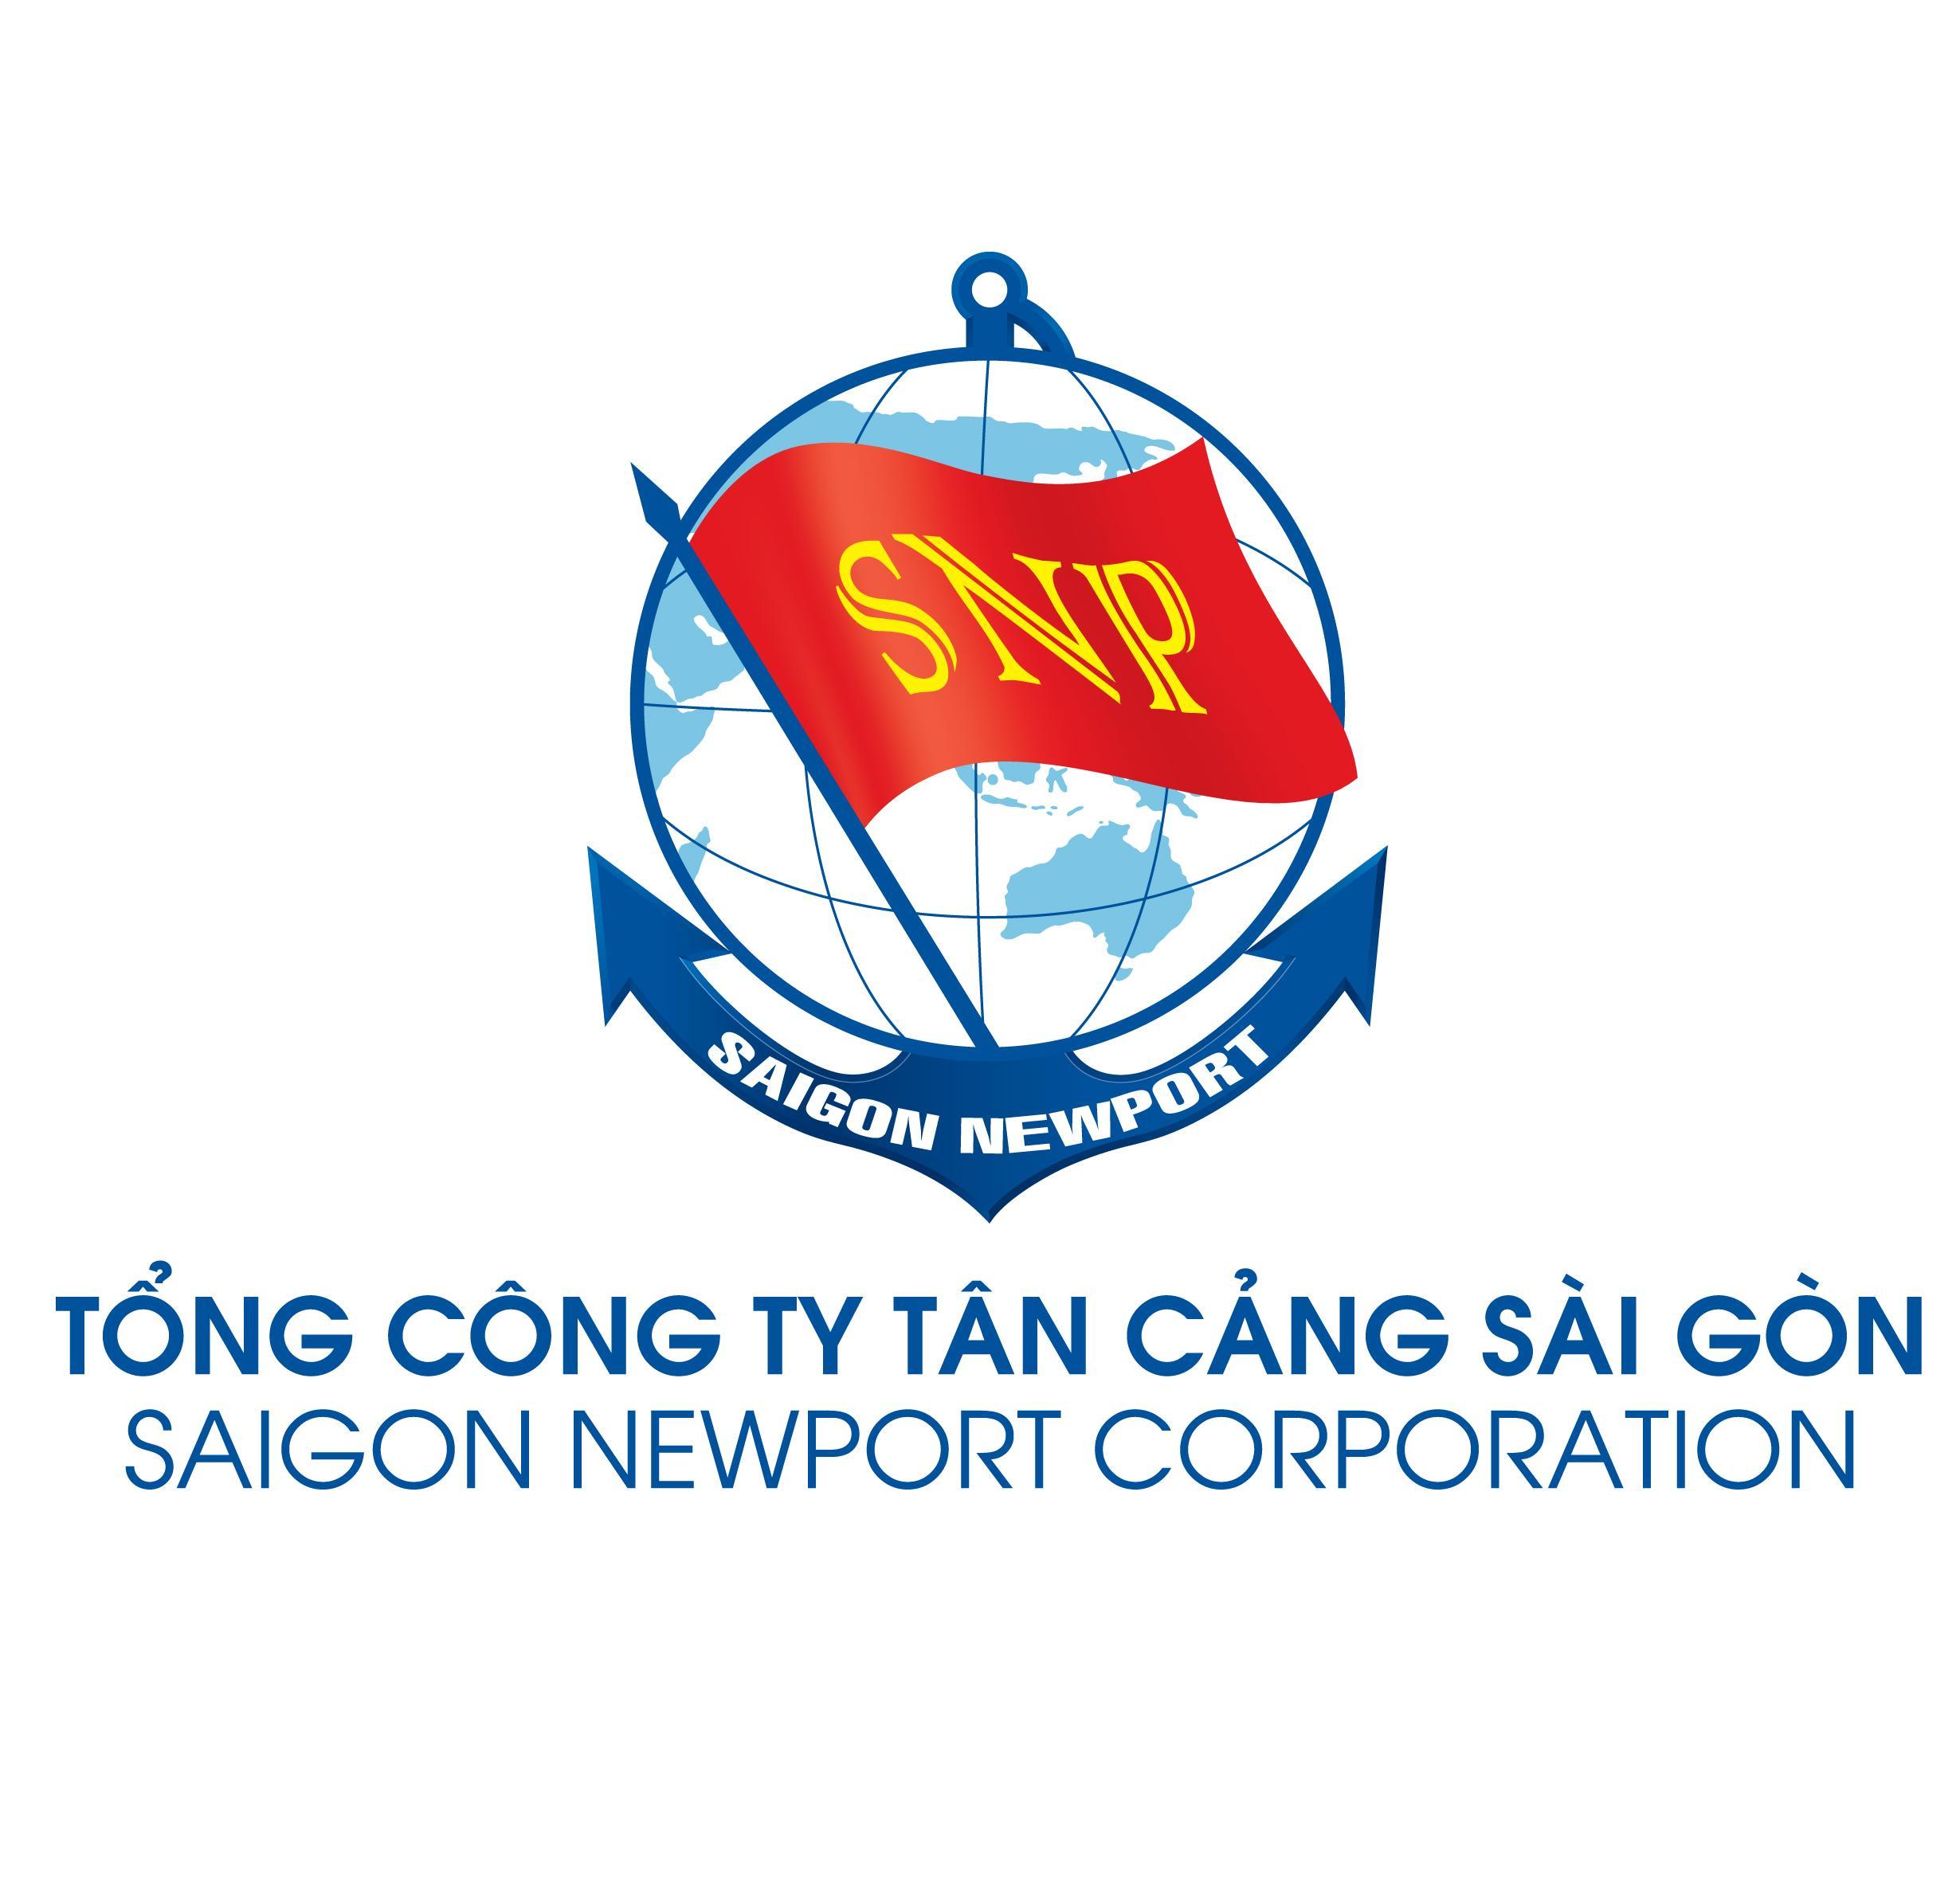 SAIGON NEWPORT CORPORATION